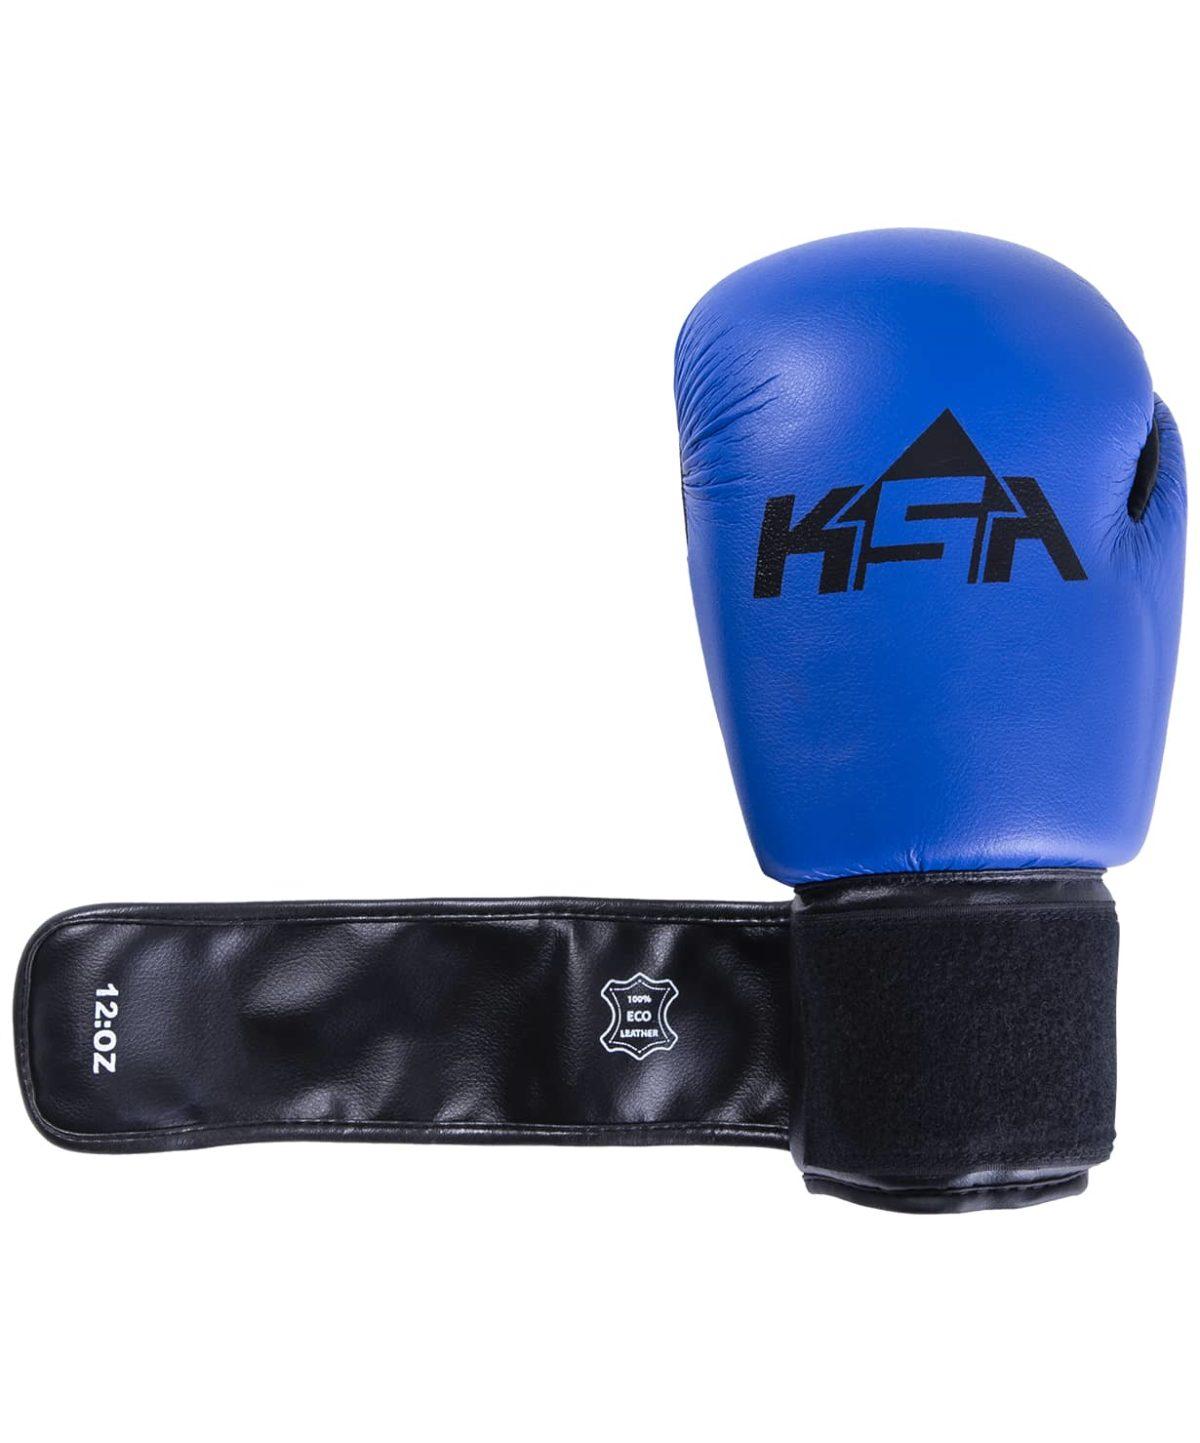 KSA Spider Blue Перчатки боксерские, 6 oz, к/з   17804 - 4